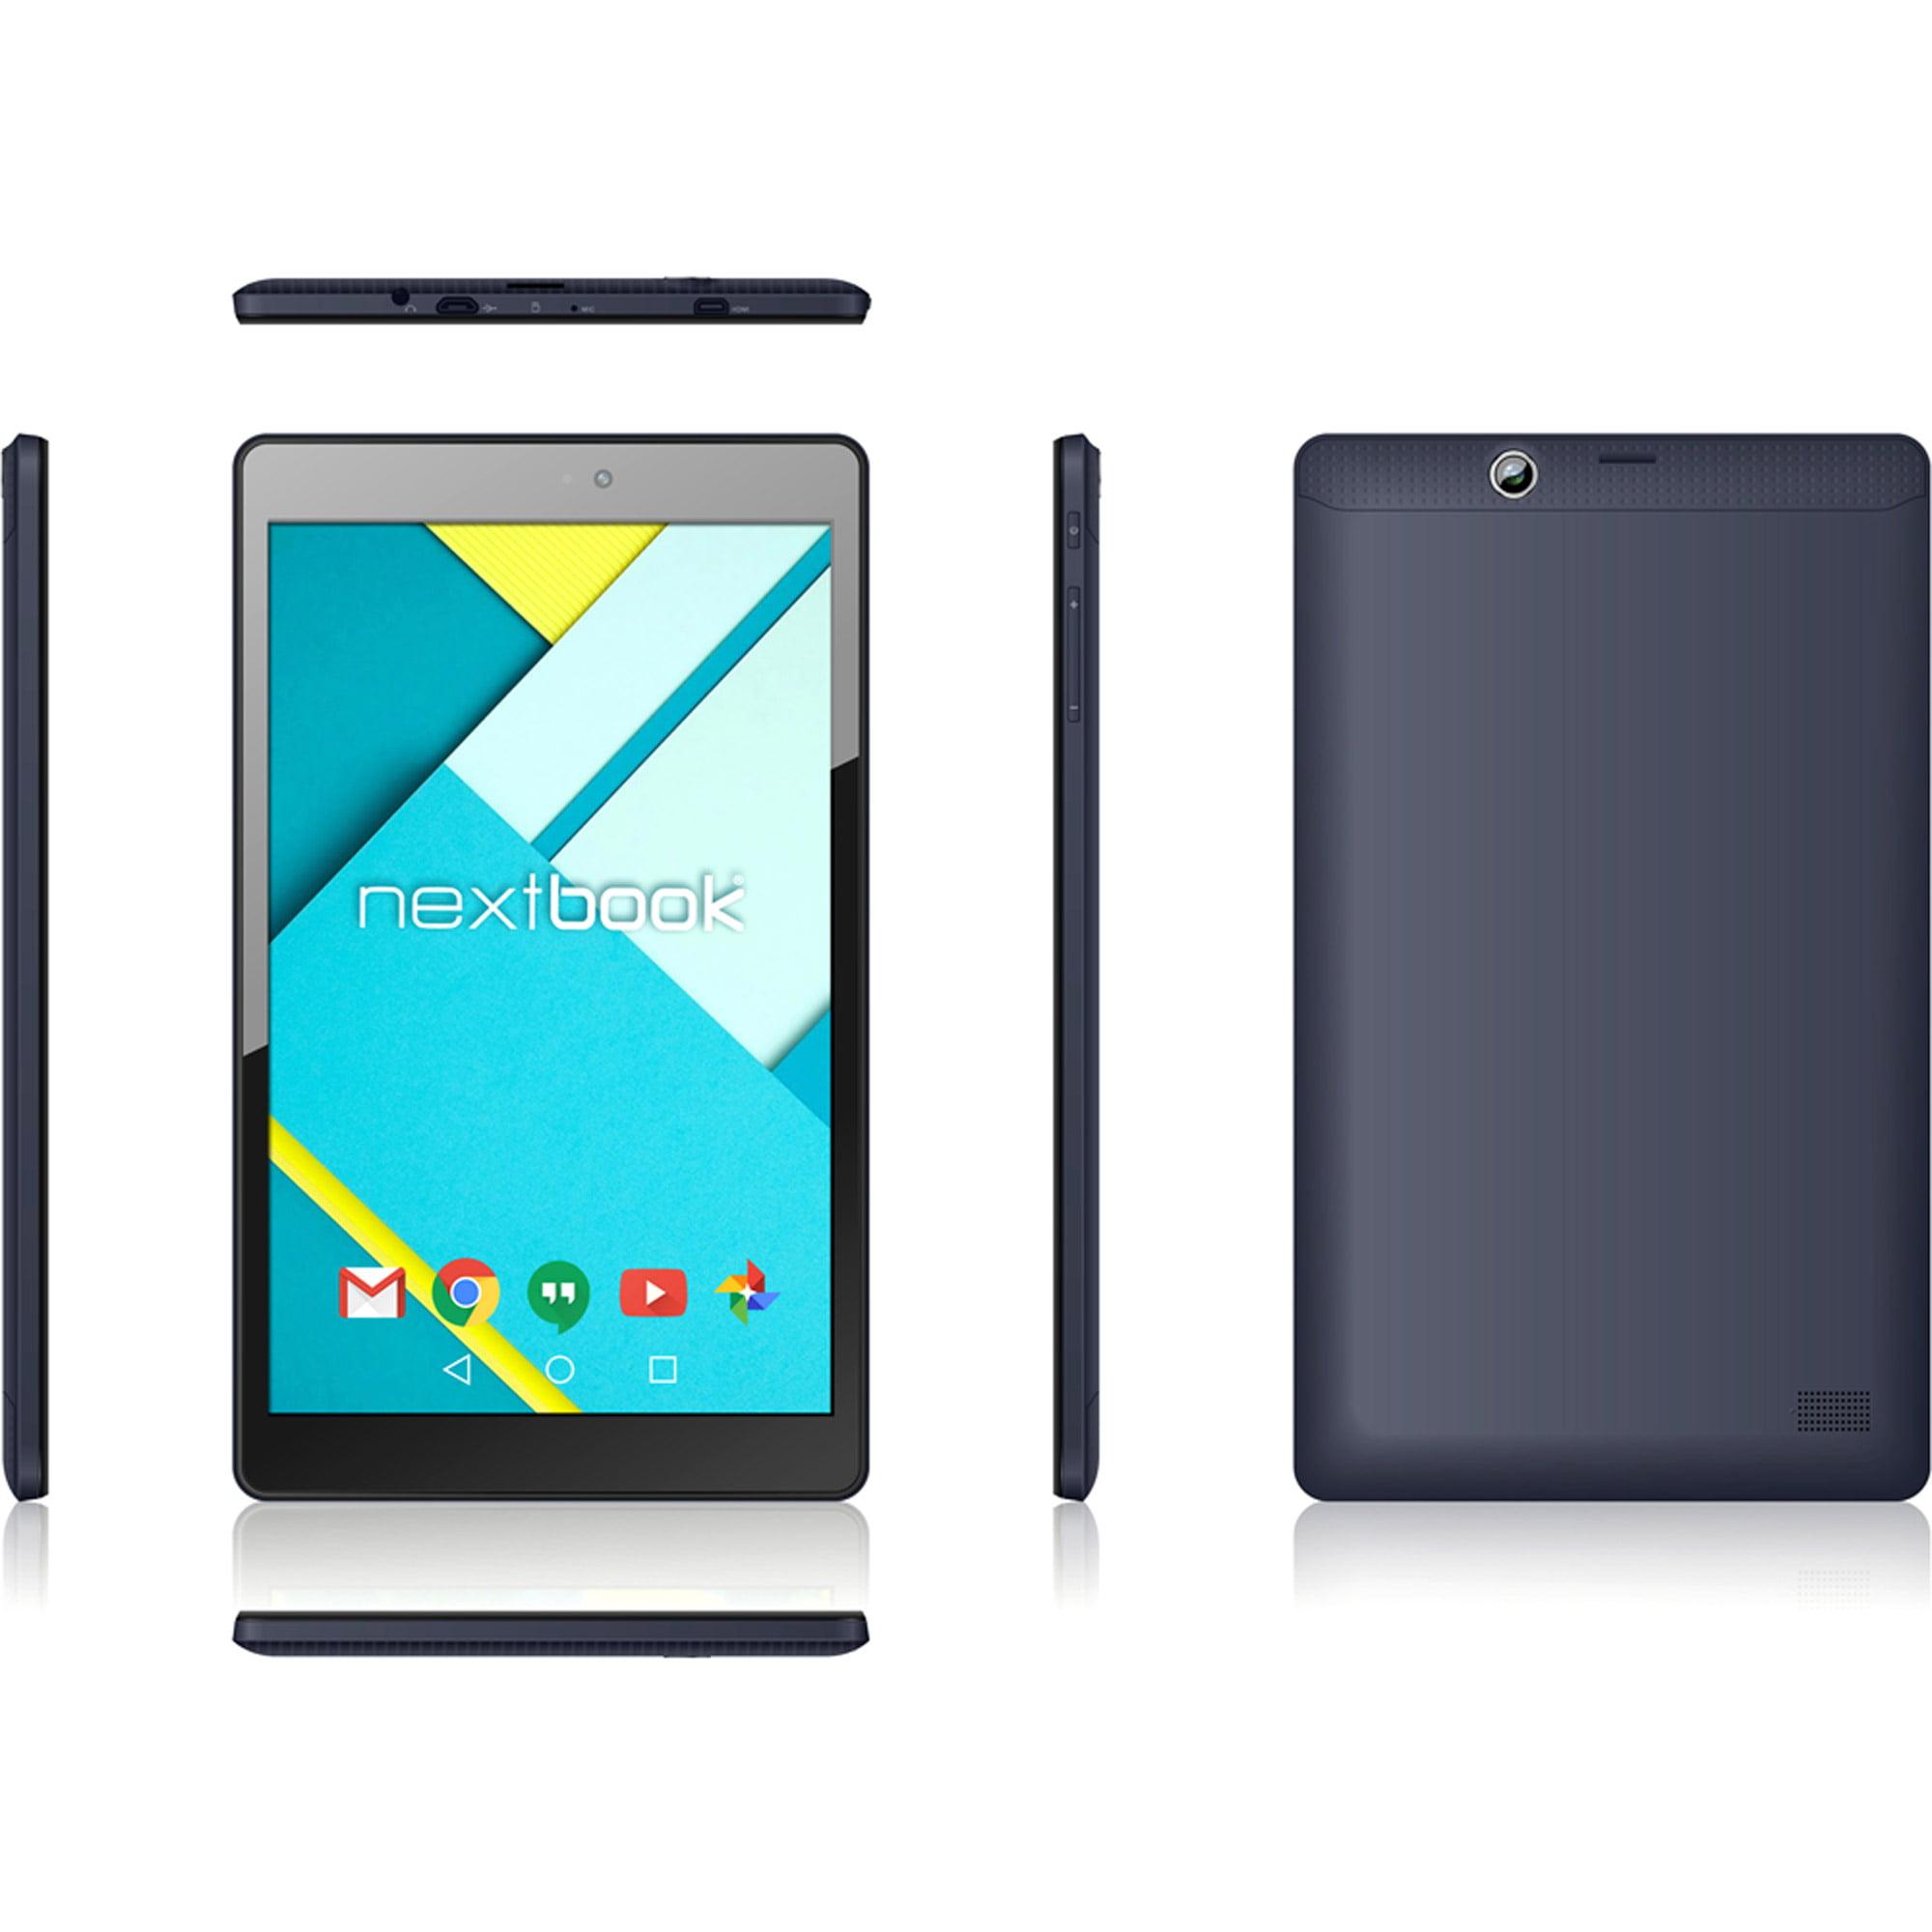 "Nextbook Ares 8L Tablet ( Verizon ) - WiFi + 4G - 16GB - Black - 8"""